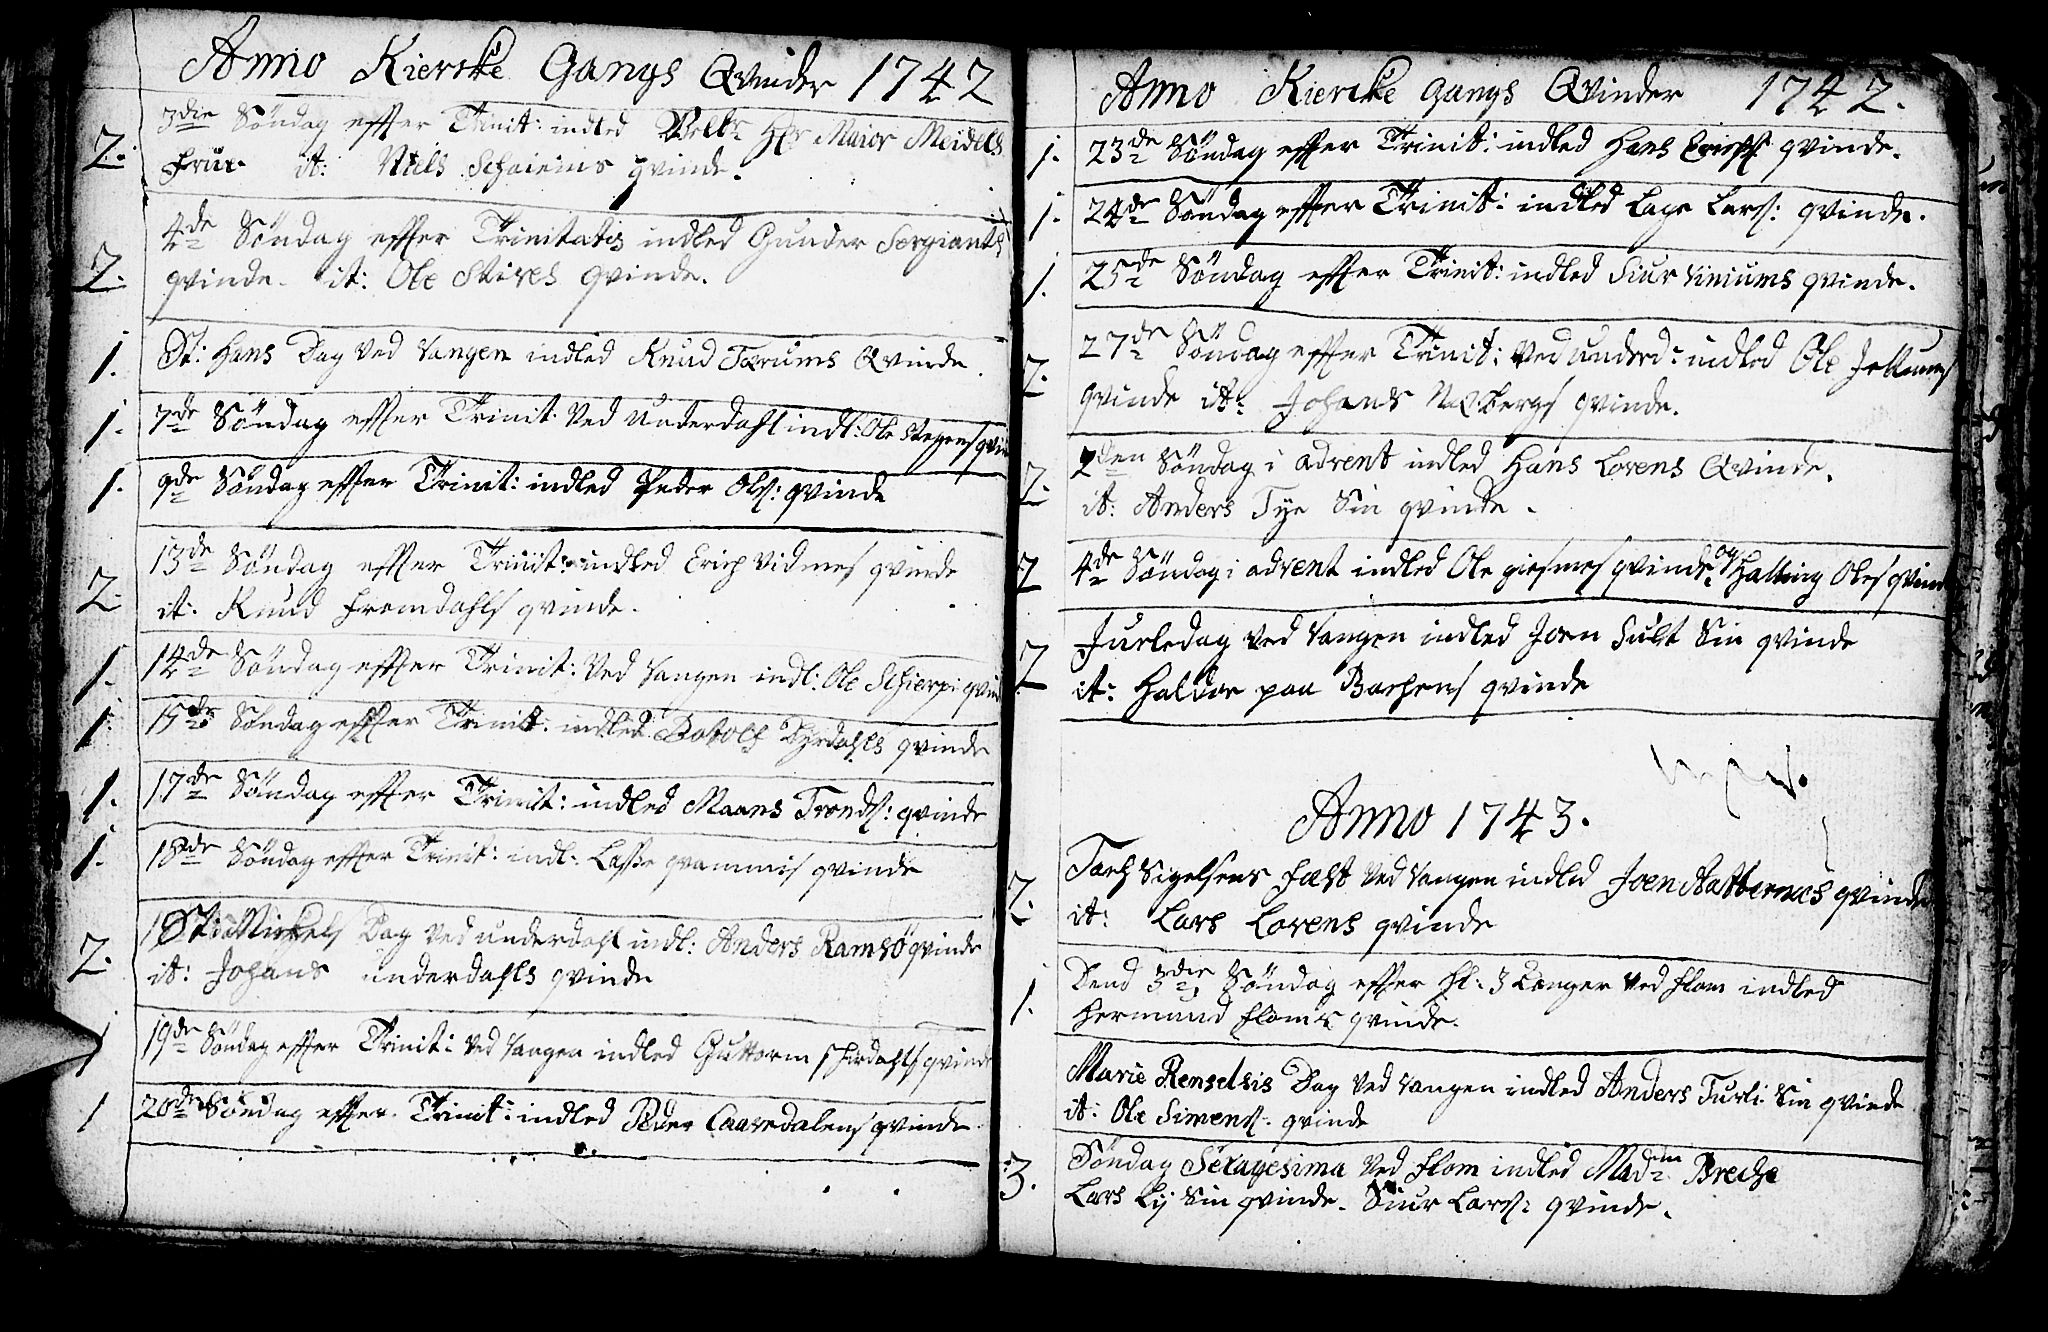 SAB, Aurland Sokneprestembete*, Parish register (official) no. A 3, 1735-1761, p. 141